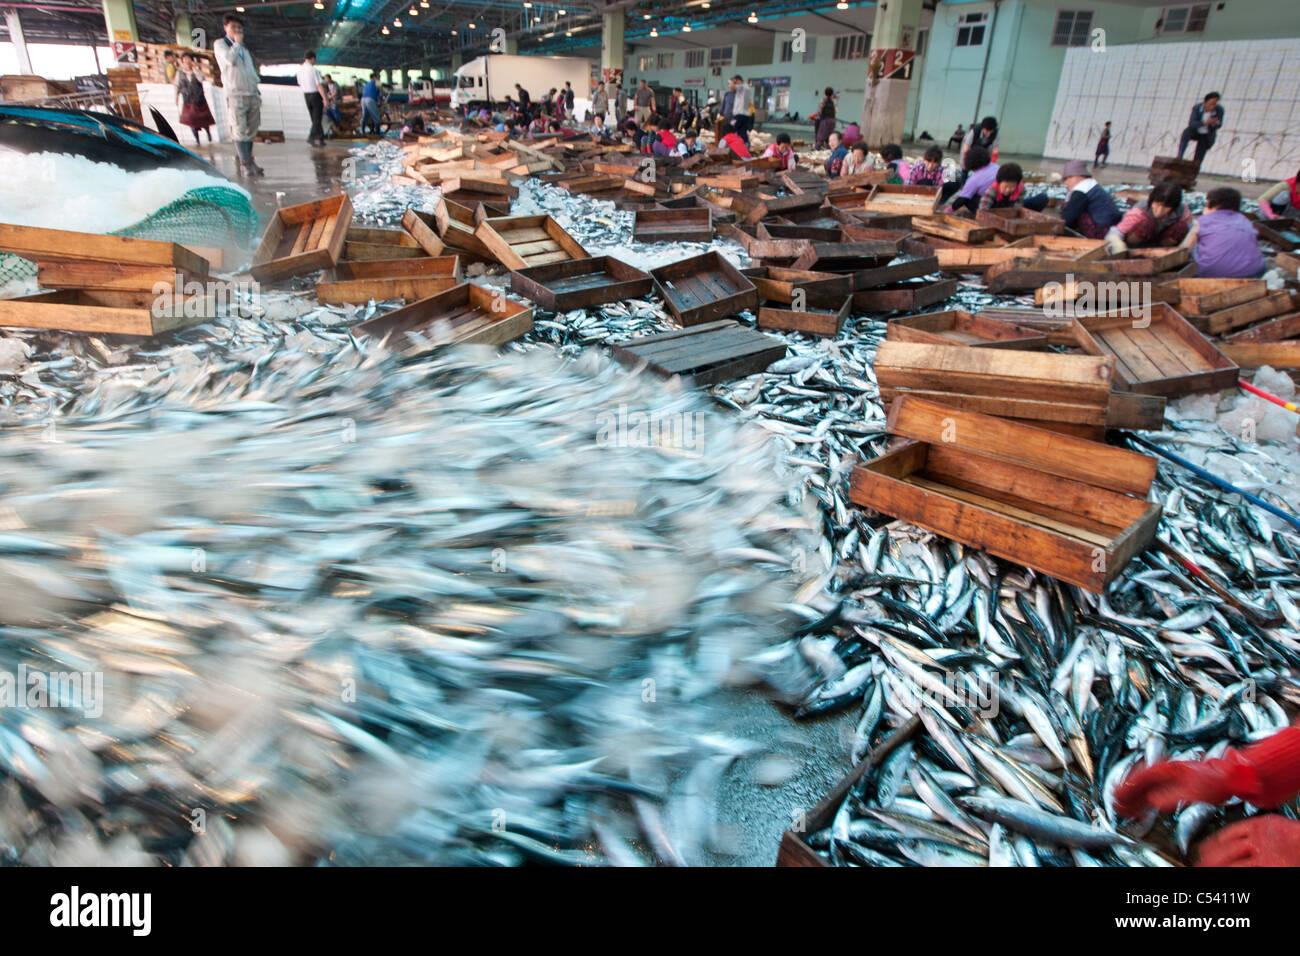 Wholesale fish market in busan pusan south korea stock for Wholesale fish market